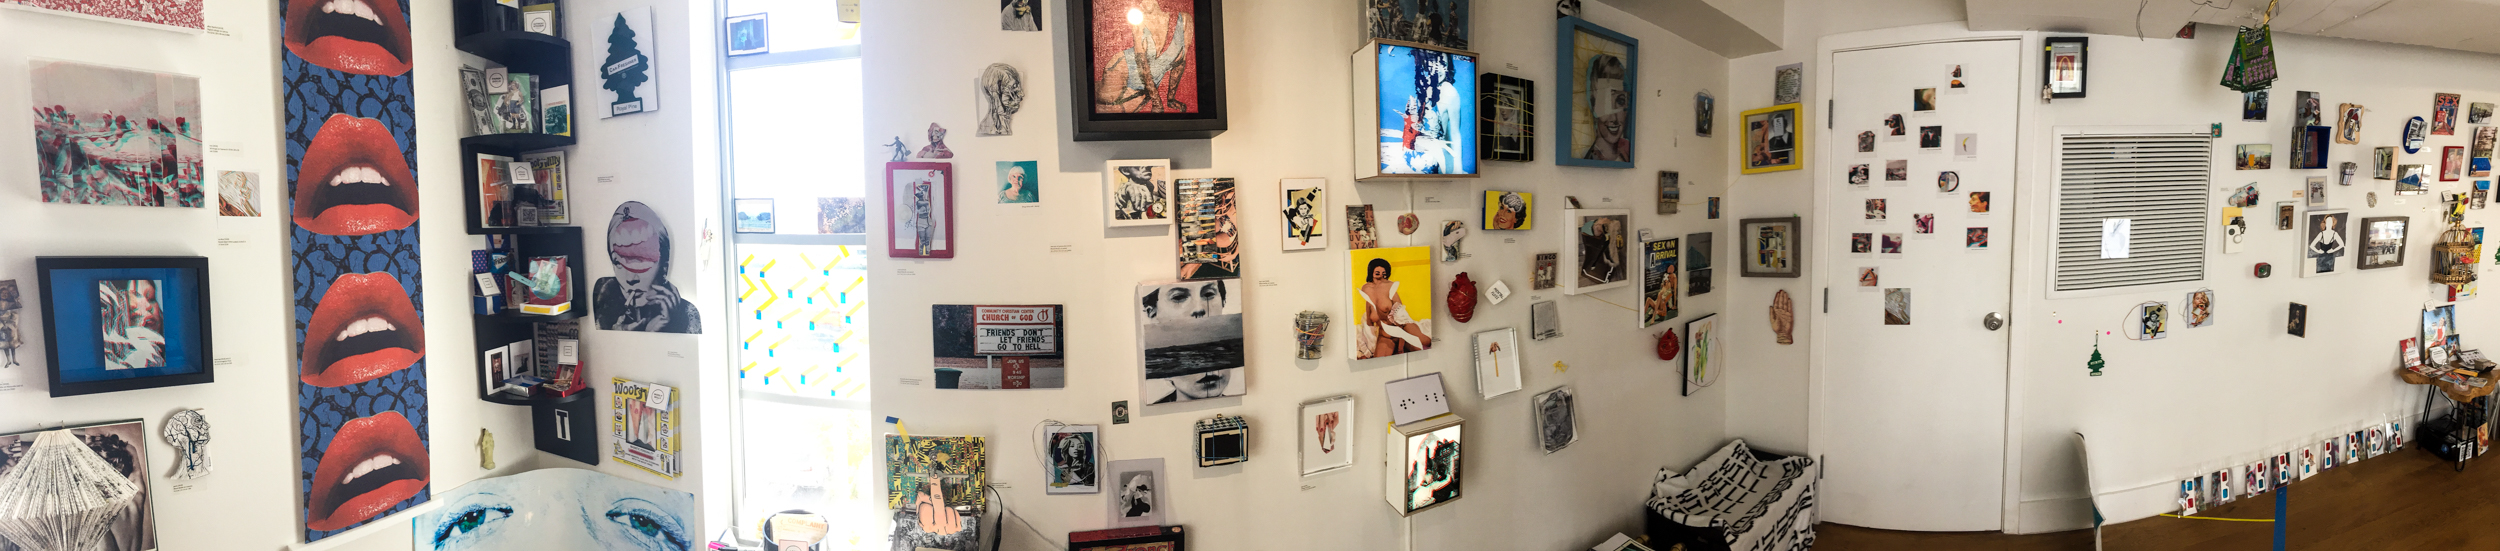 Faena-Exhibition-Images-124.jpg